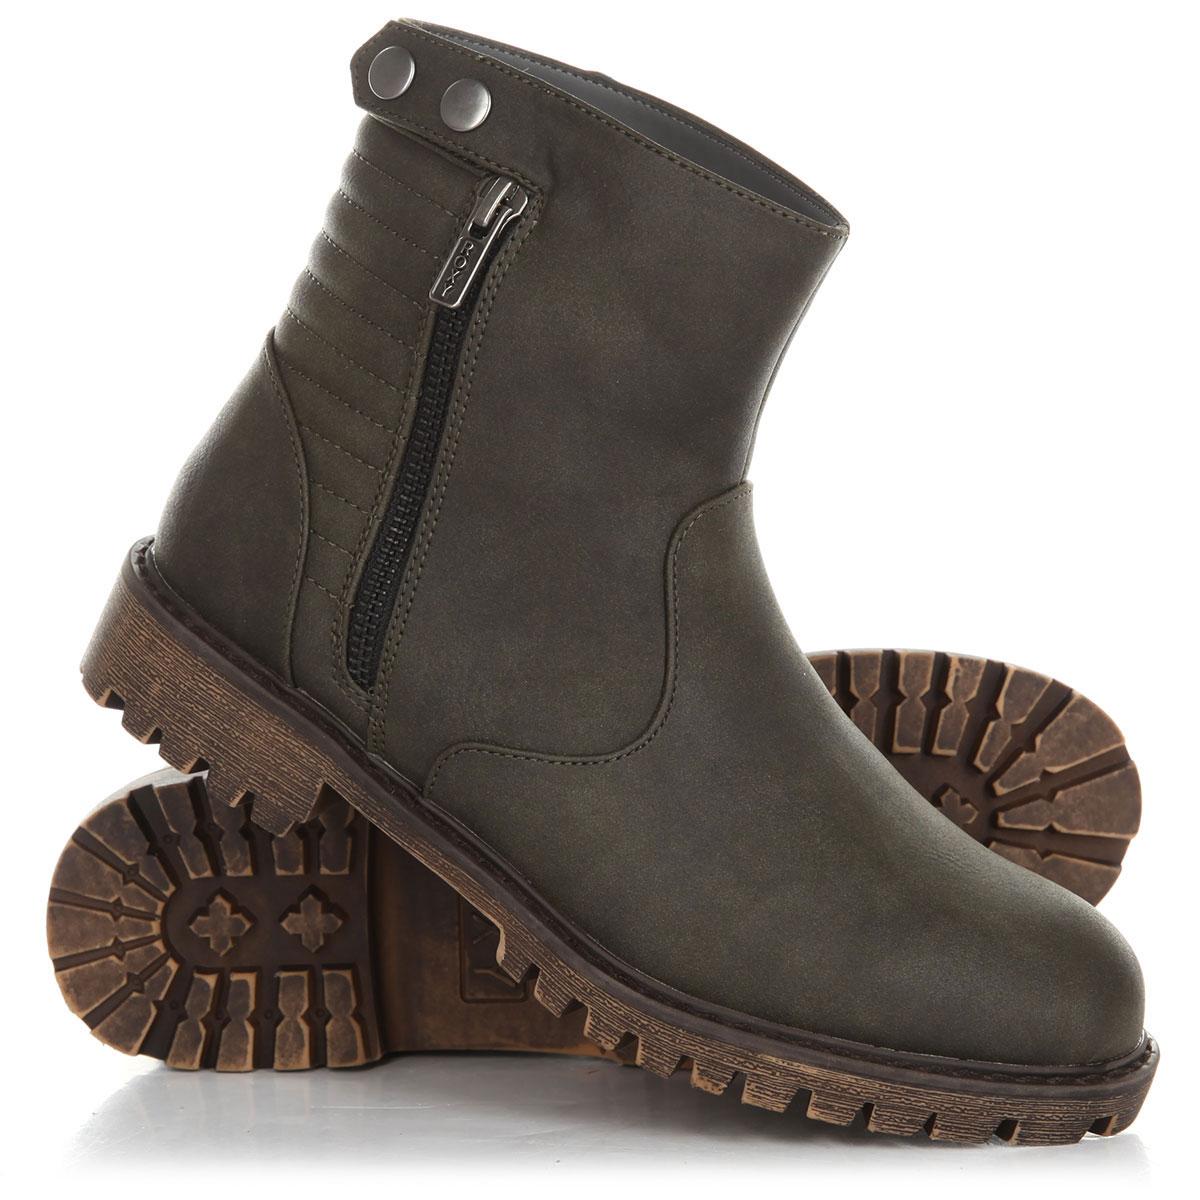 dedb603bc25d Купить ботинки зимние женские Roxy Margo Boot Charcoal (ARJB700579-CHR) в  интернет-магазине Proskater.by